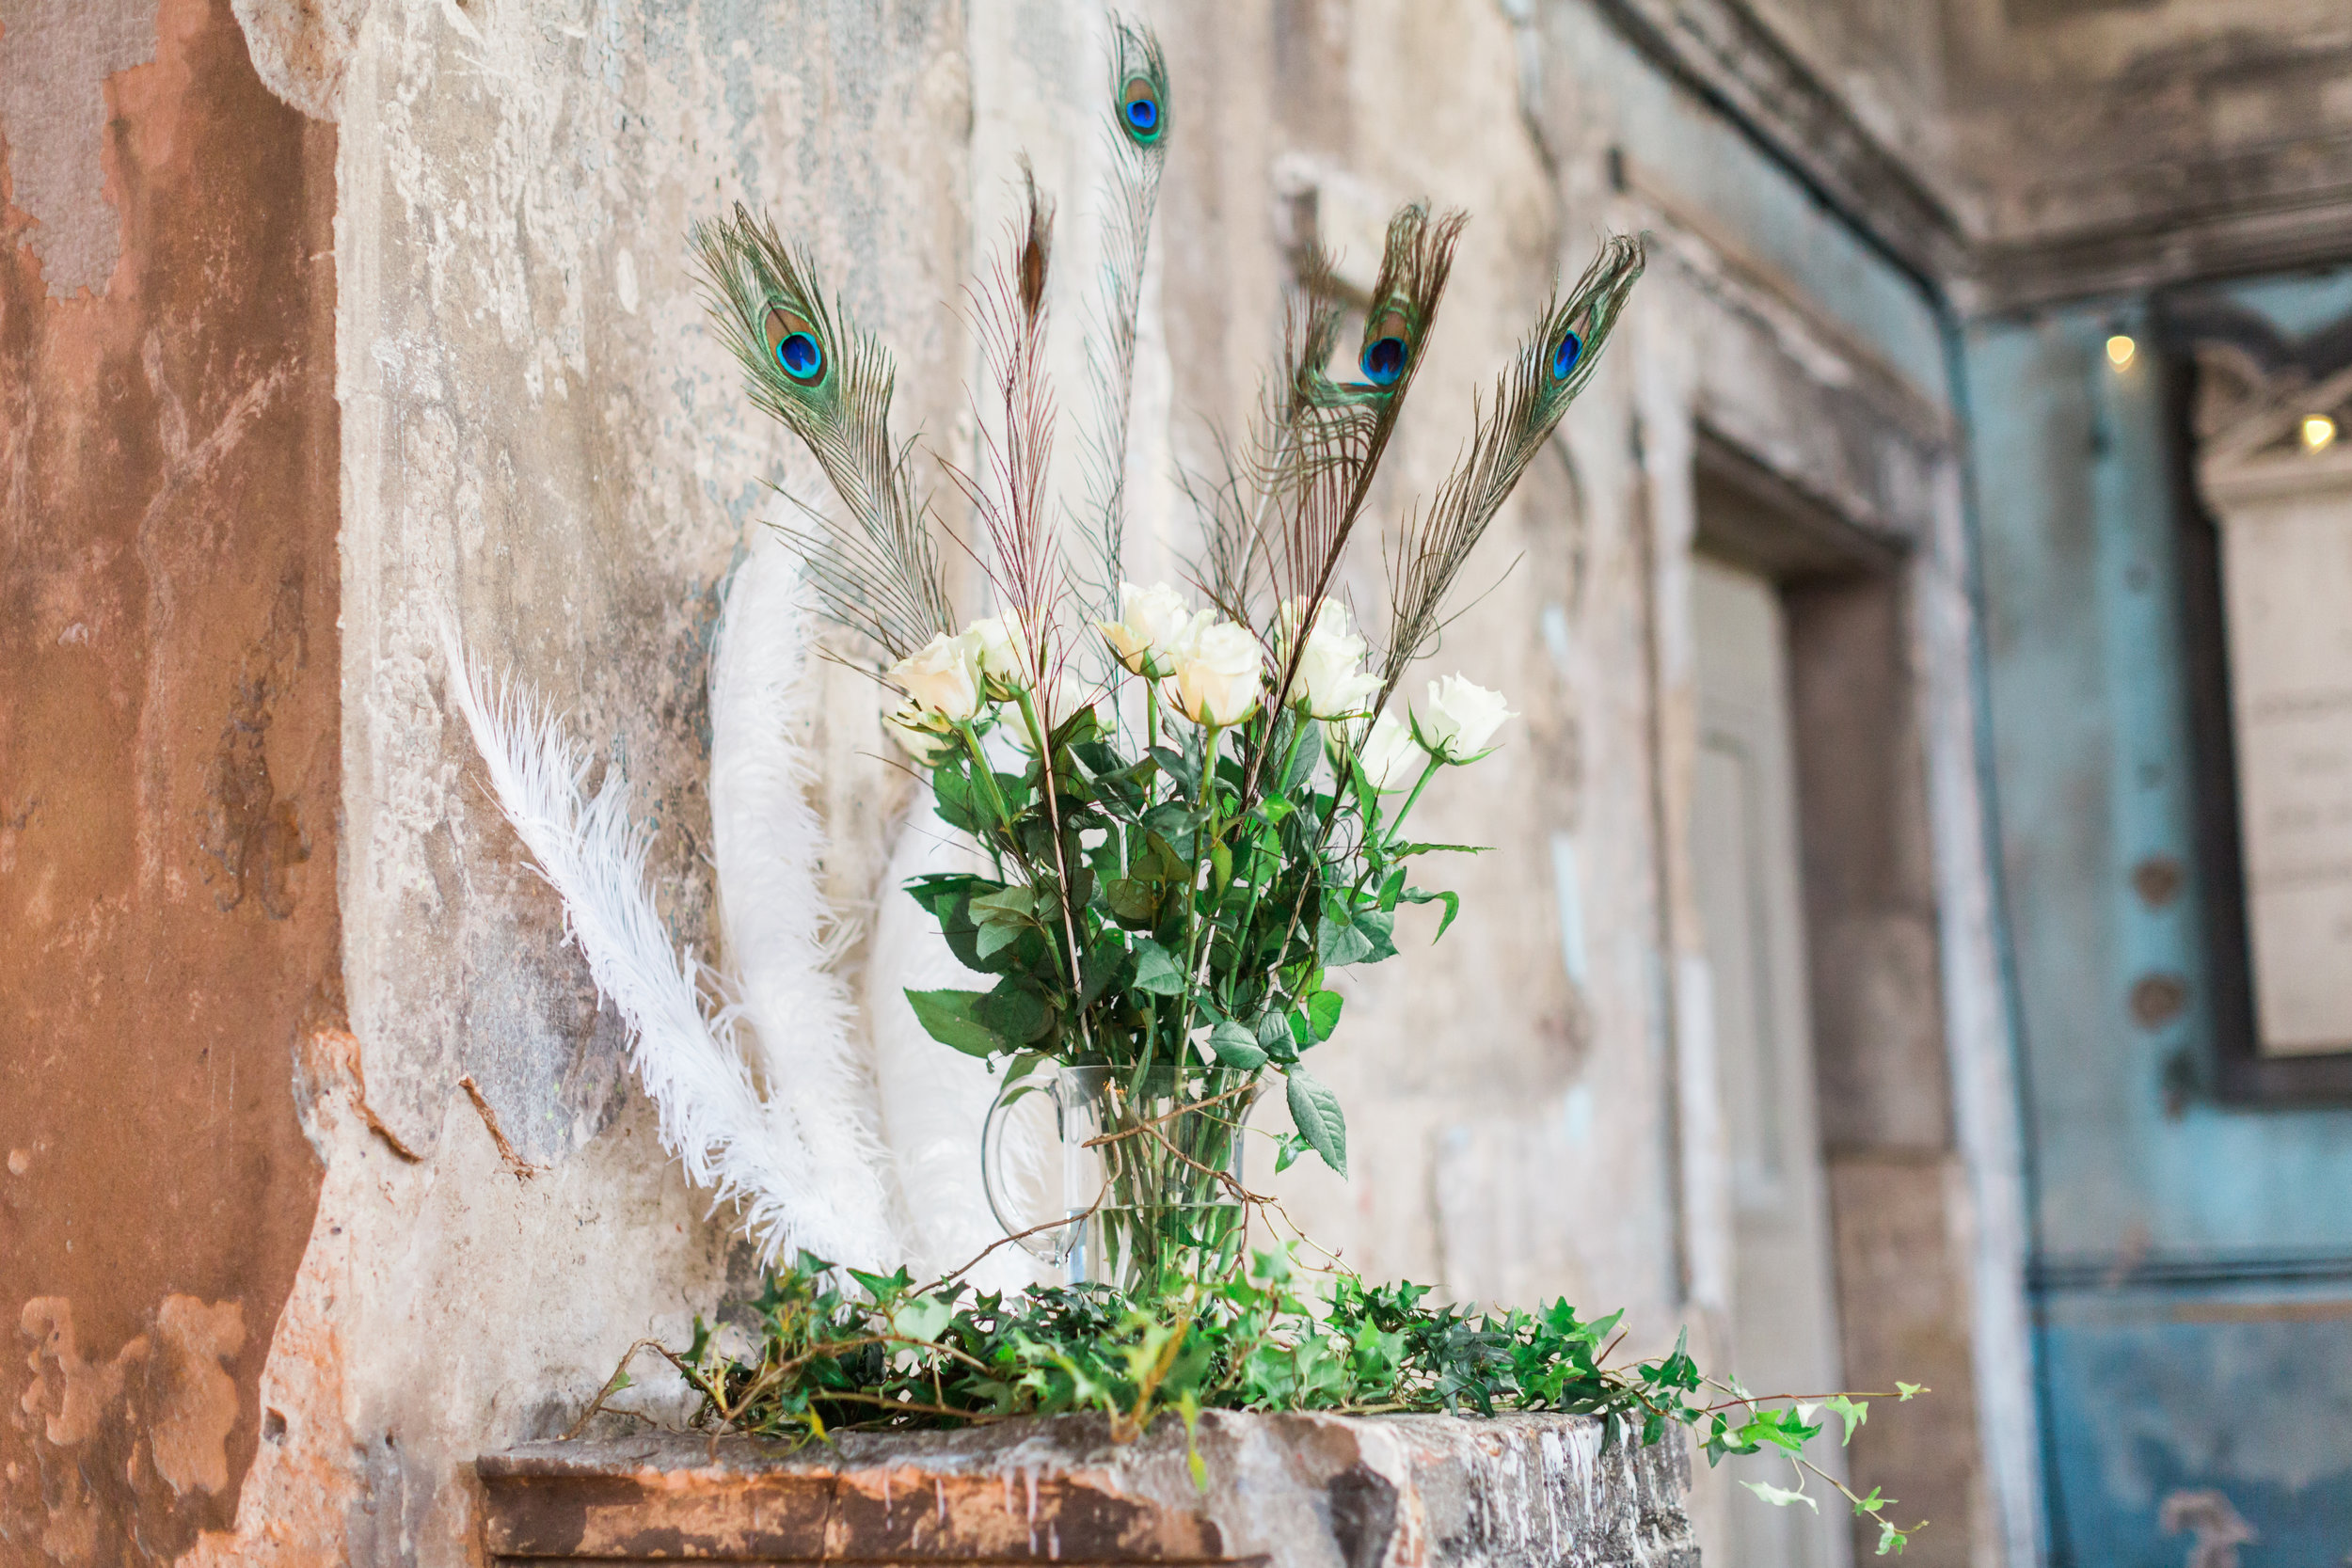 beautiful peacock feathers at wedding.jpg